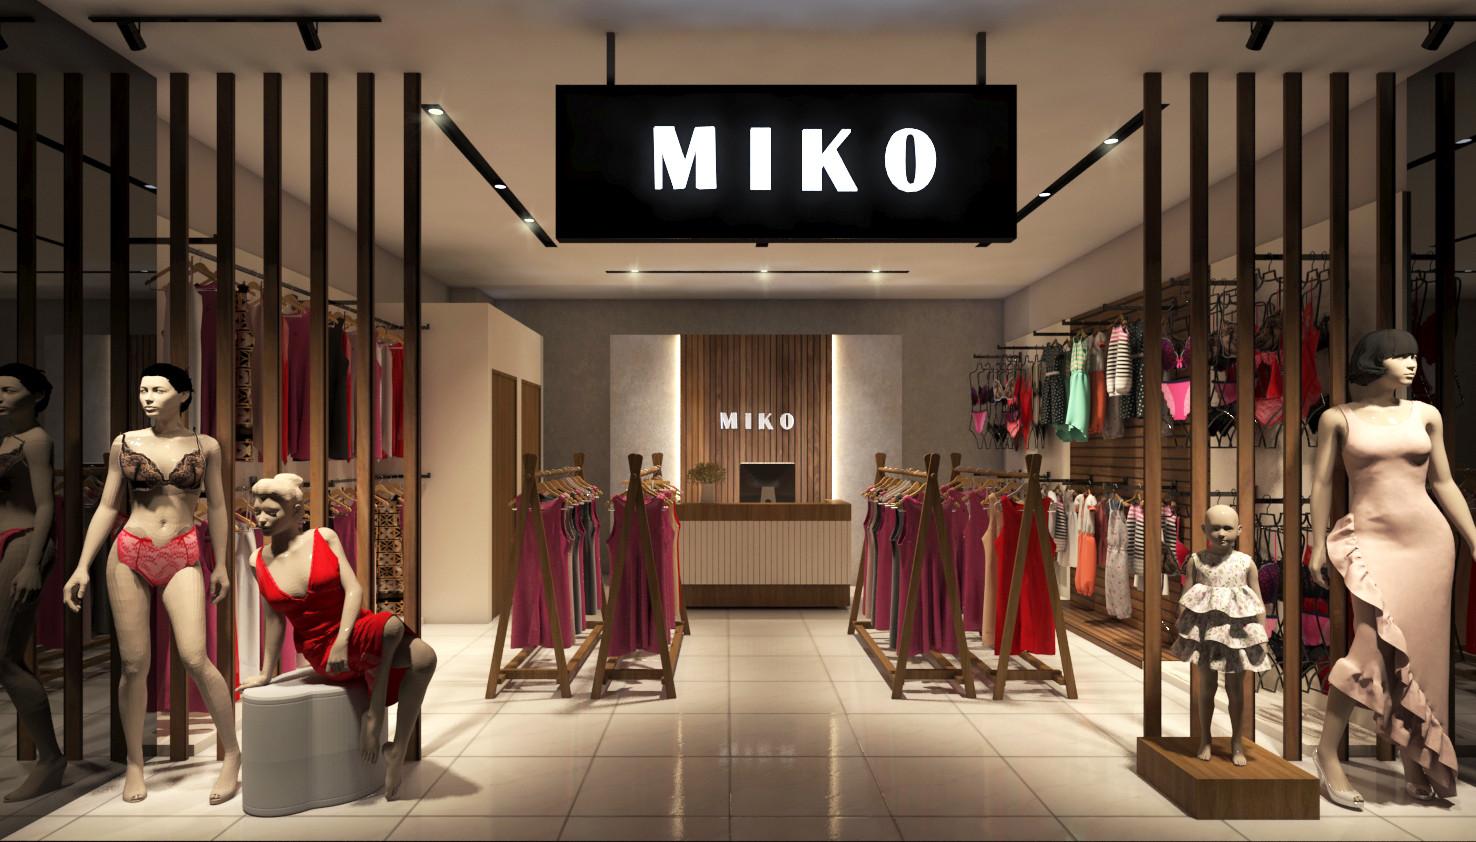 Miko Boutique store